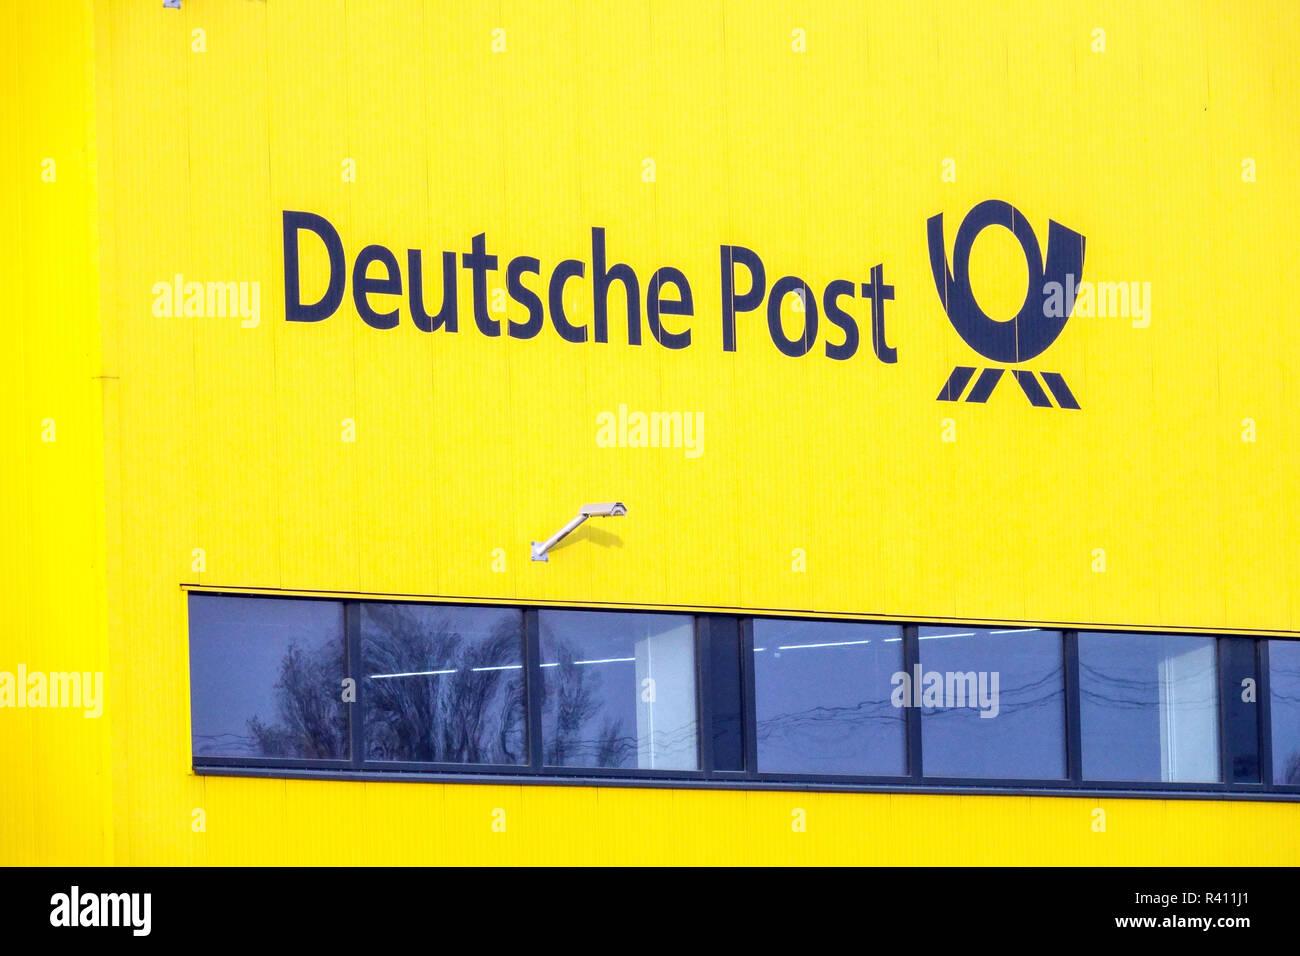 Deutsche Post Logo, Distribution Center, Berlin Germany - Stock Image